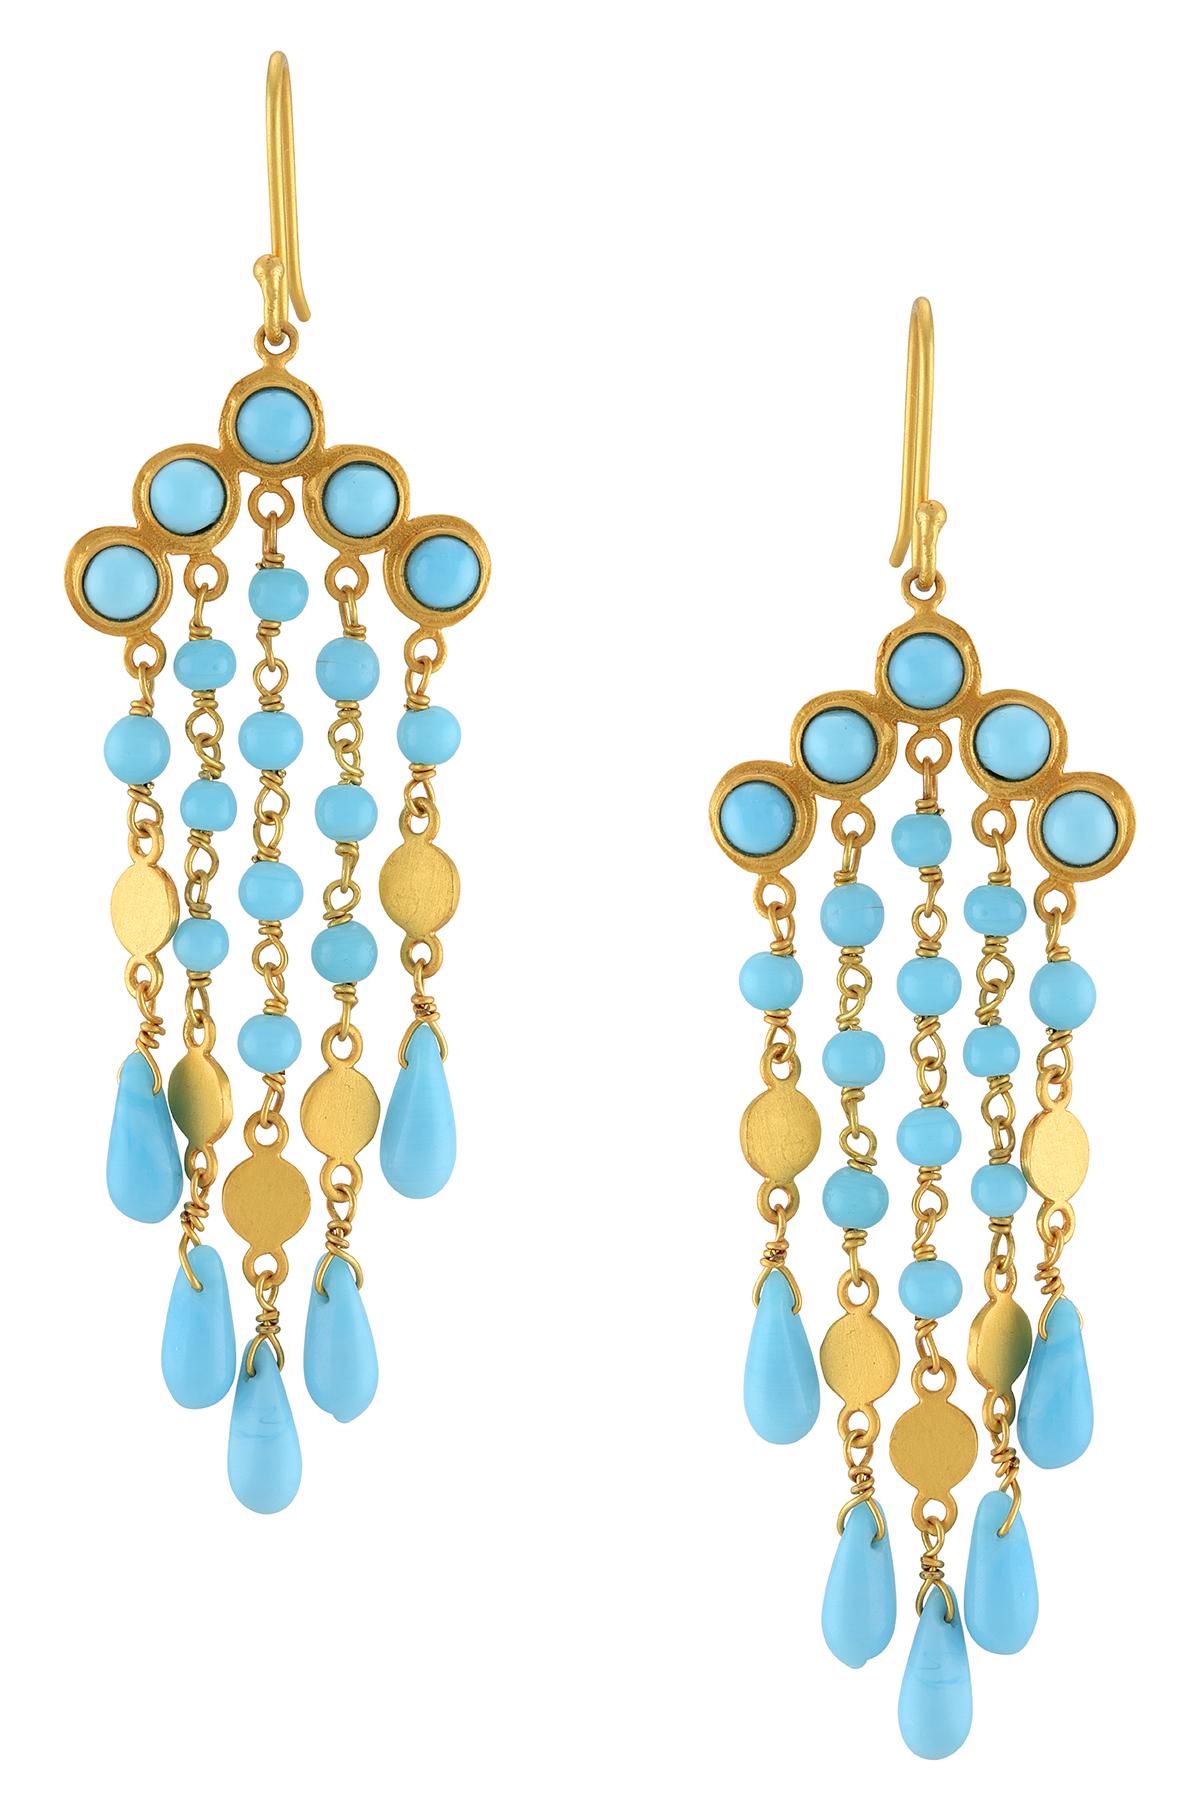 Gold Plated Five Strand Tassel Earrings